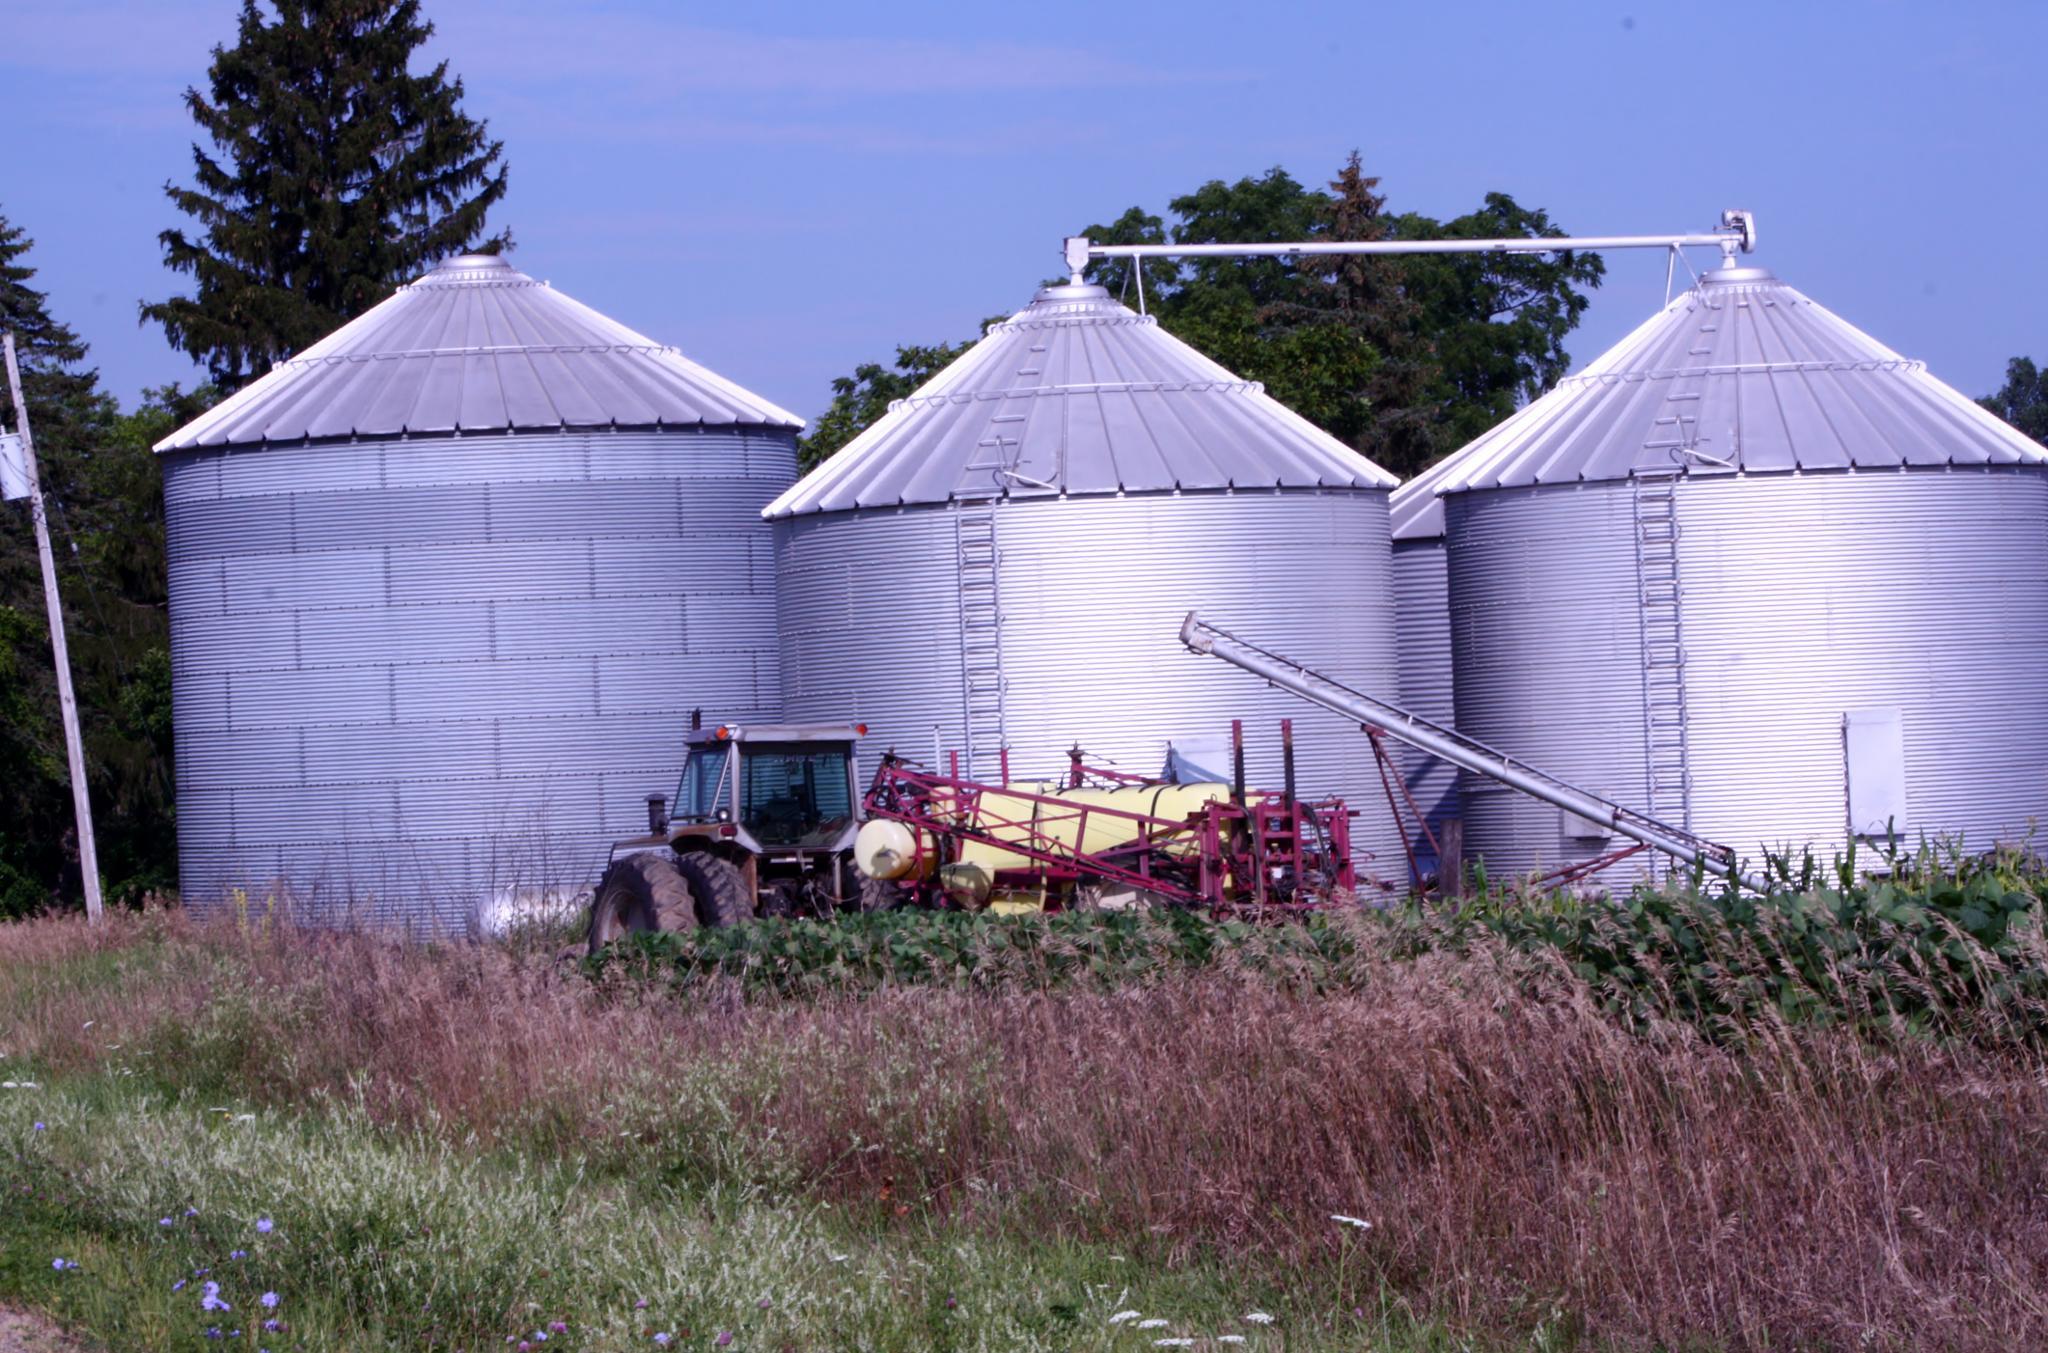 Grain Dryers by cindy.martin.7503